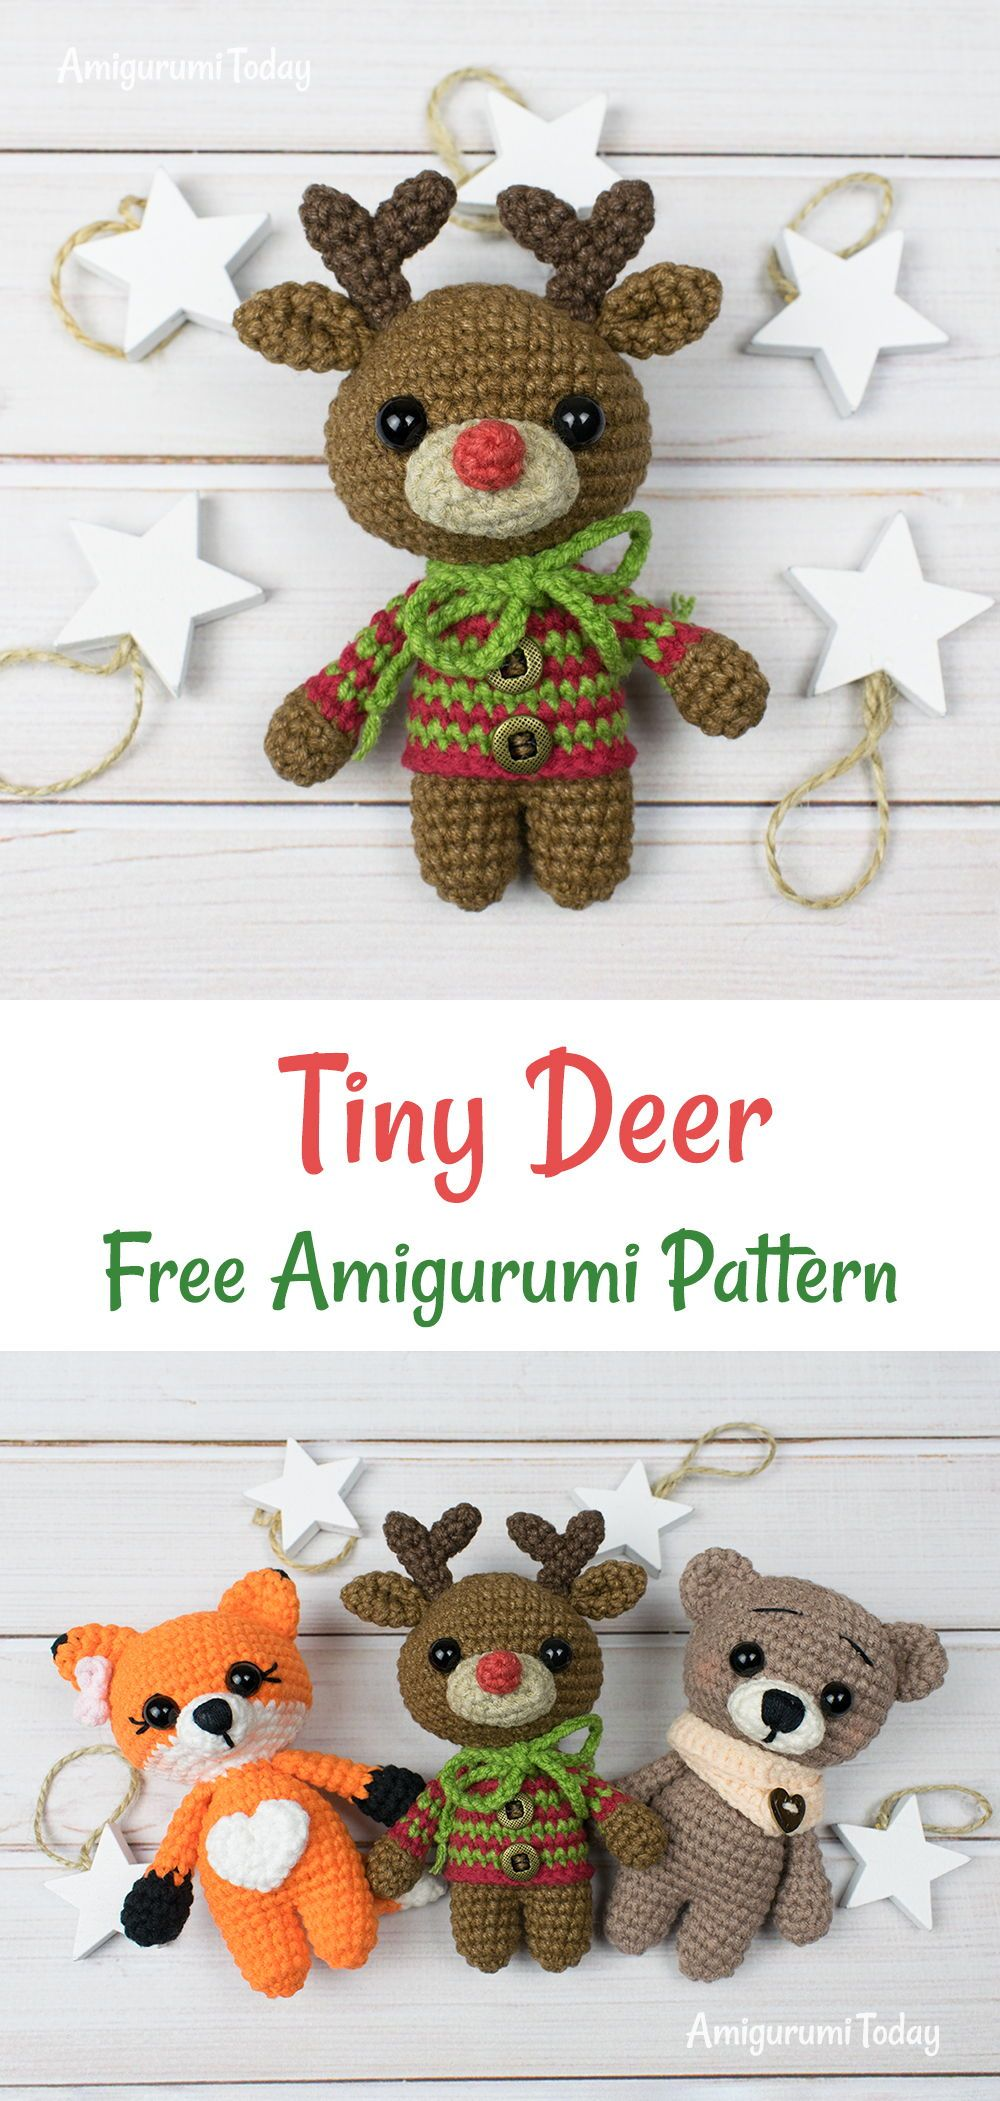 Tiny Deer Amigurumi Pattern Crochet Pinterest Crochet Crochet